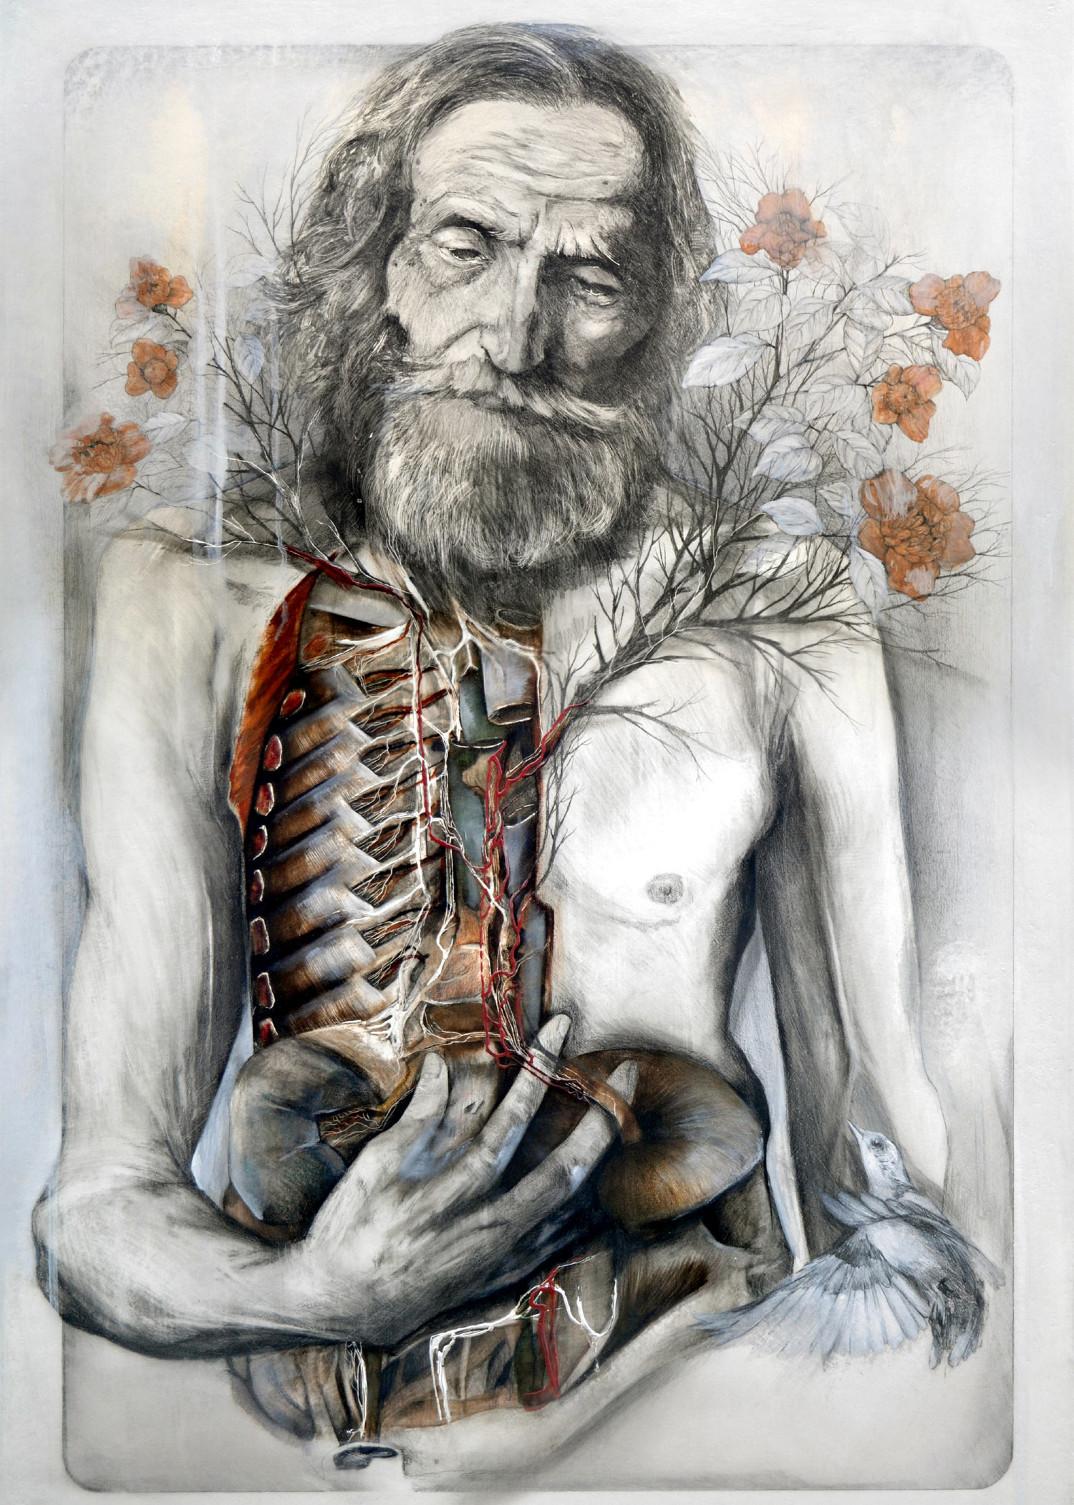 dipinti-corpi-anatomia-nunzio-paci-5